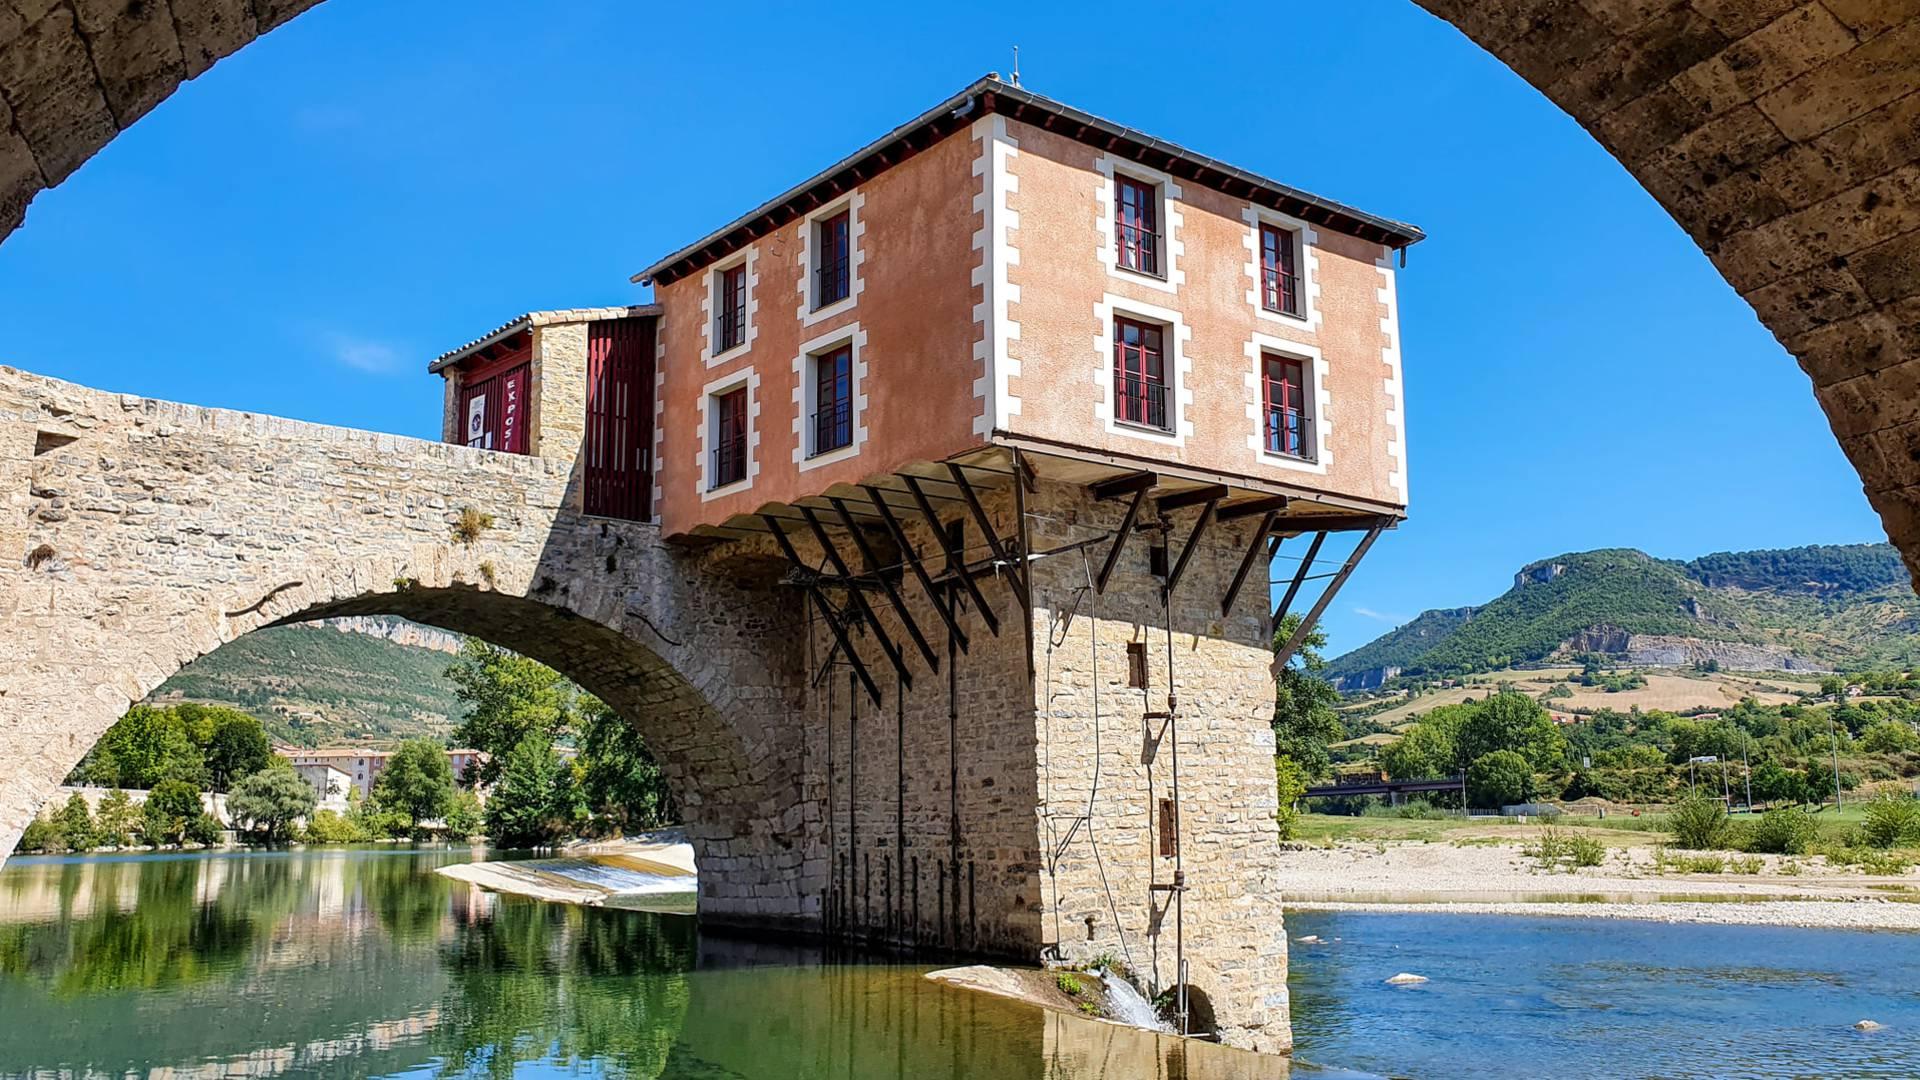 Pont-vieux de Millau - ©jeanjean